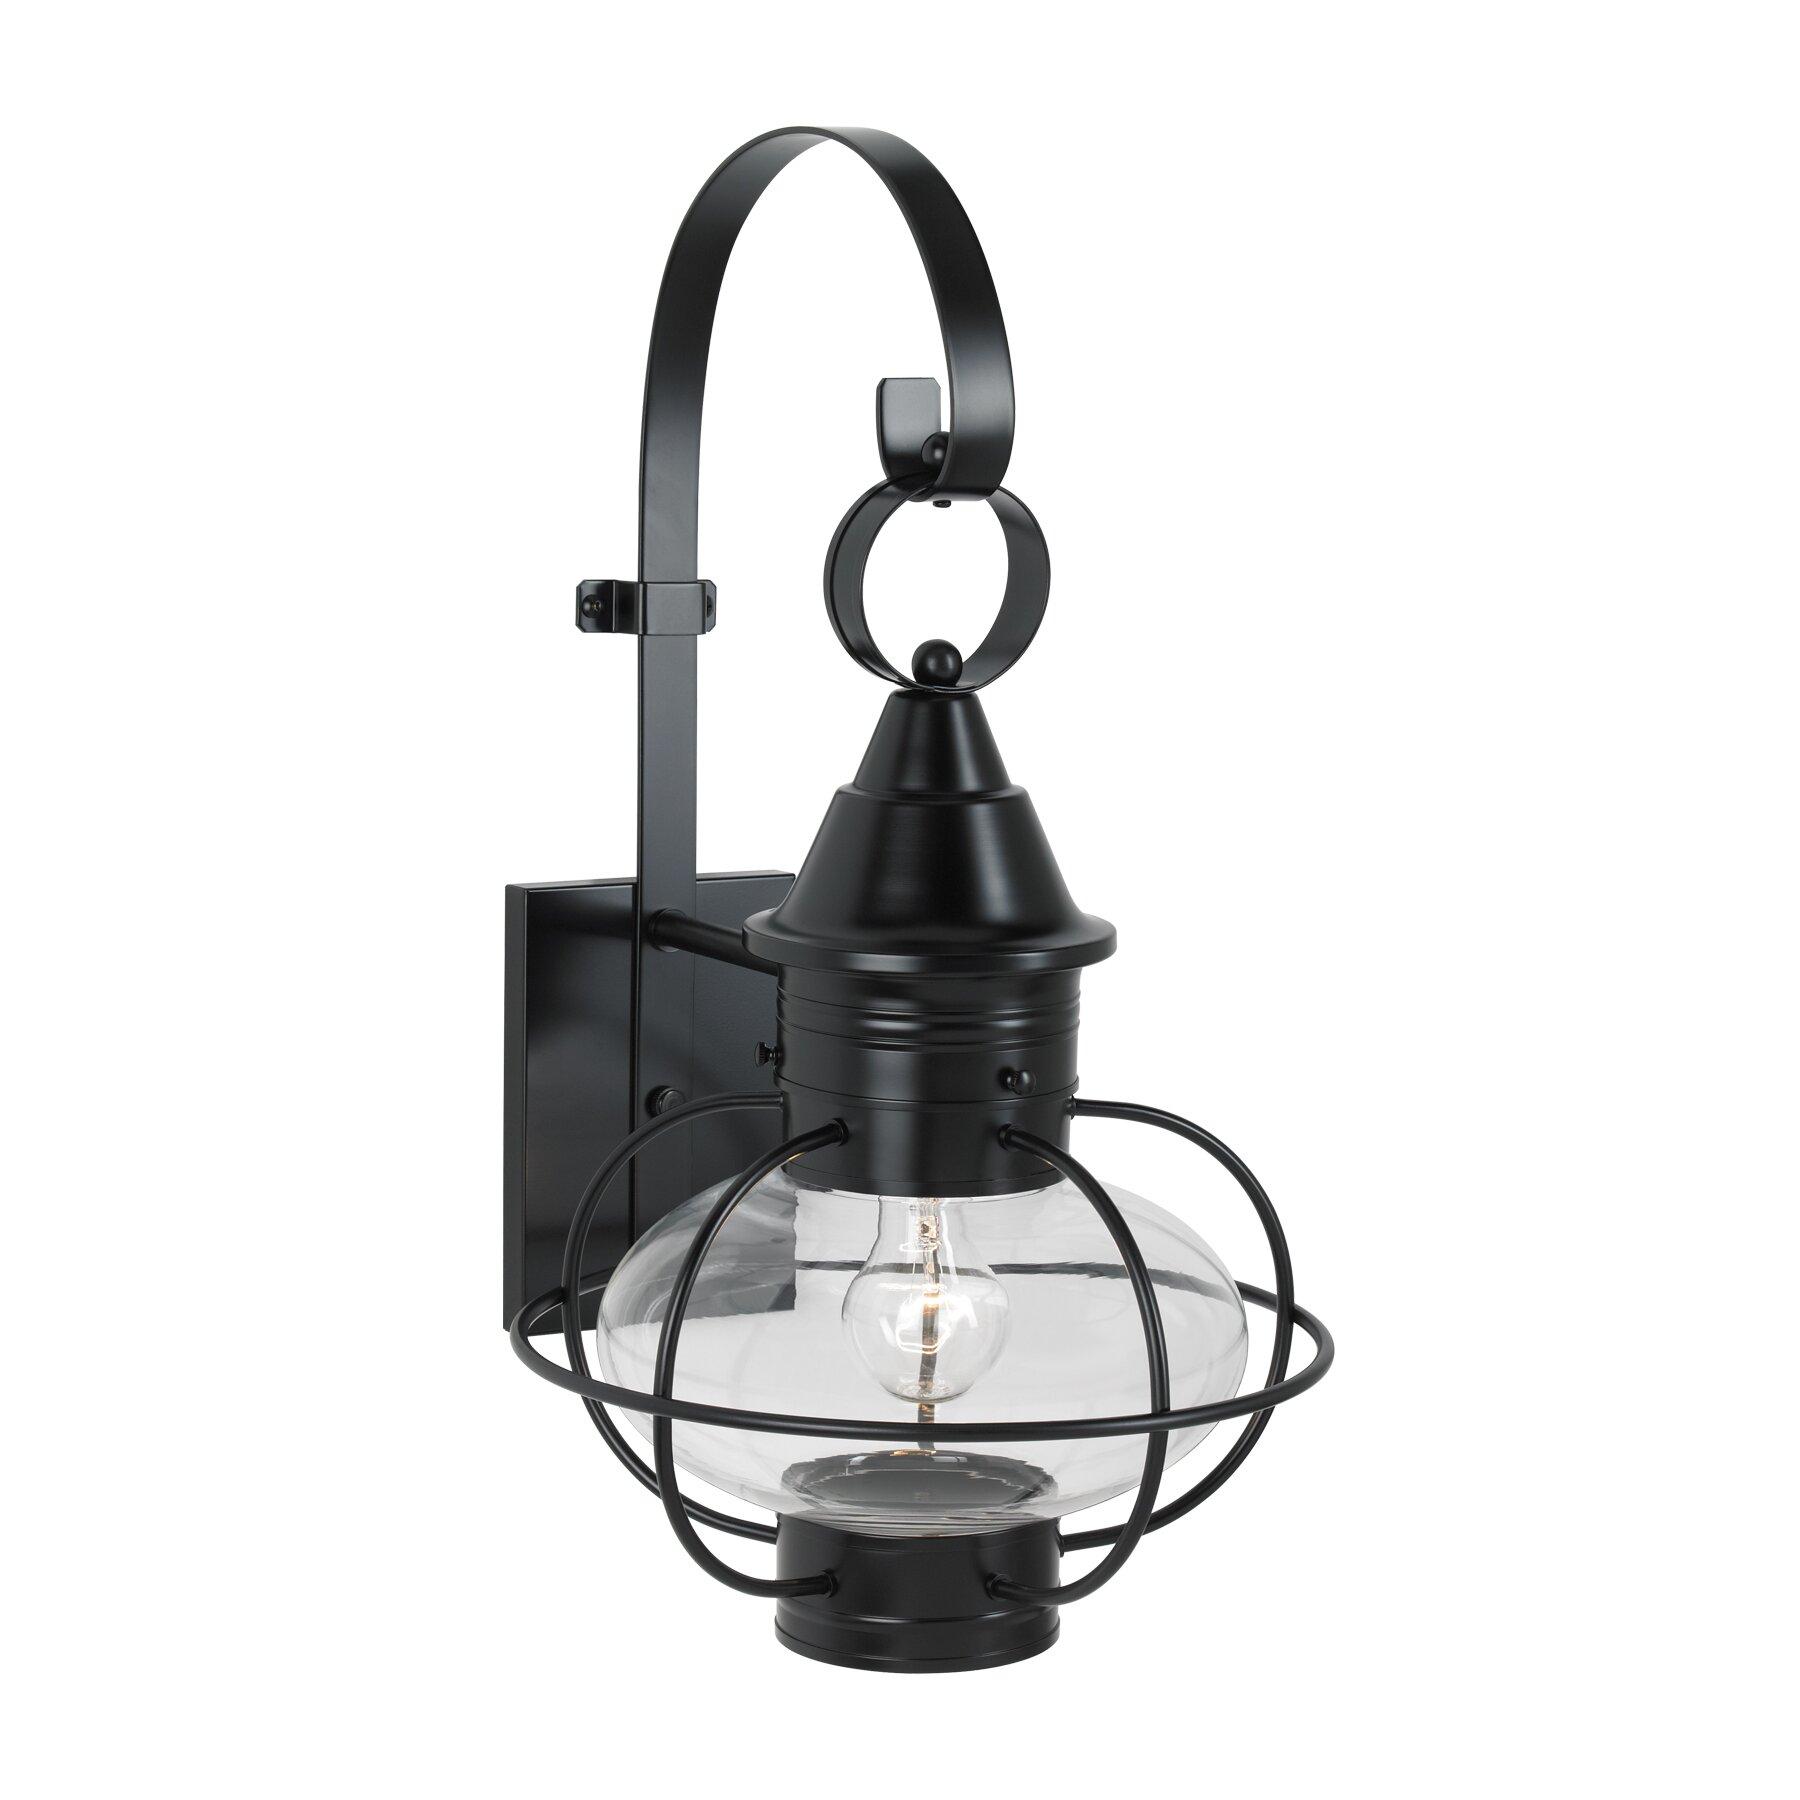 new vidalia onion 1 light outdoor wall lantern by norwell lighting. Black Bedroom Furniture Sets. Home Design Ideas